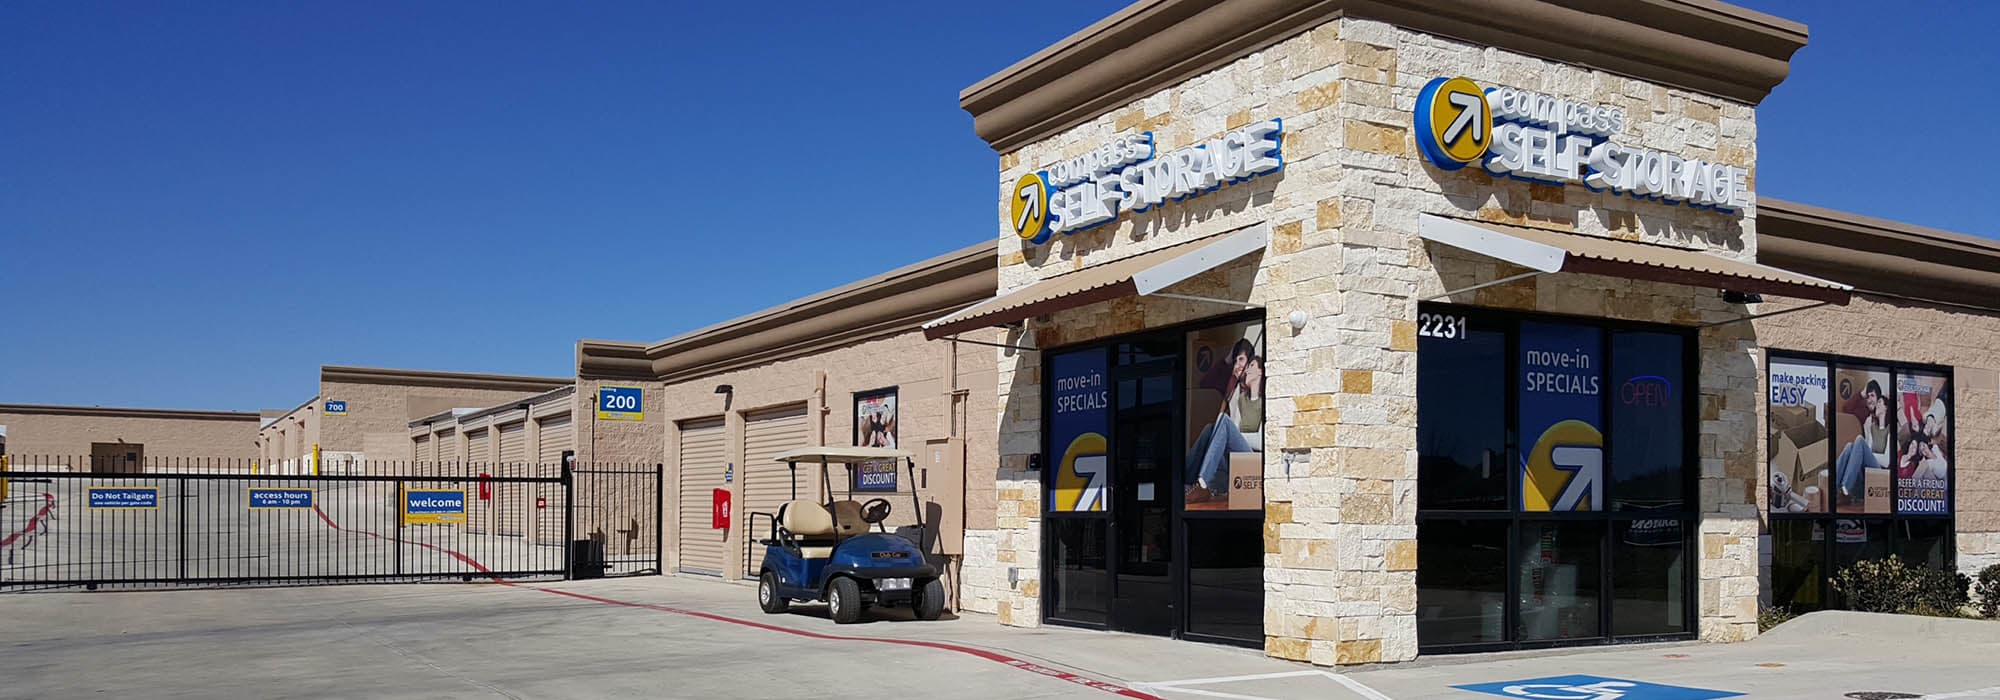 Self storage in Mansfield TX